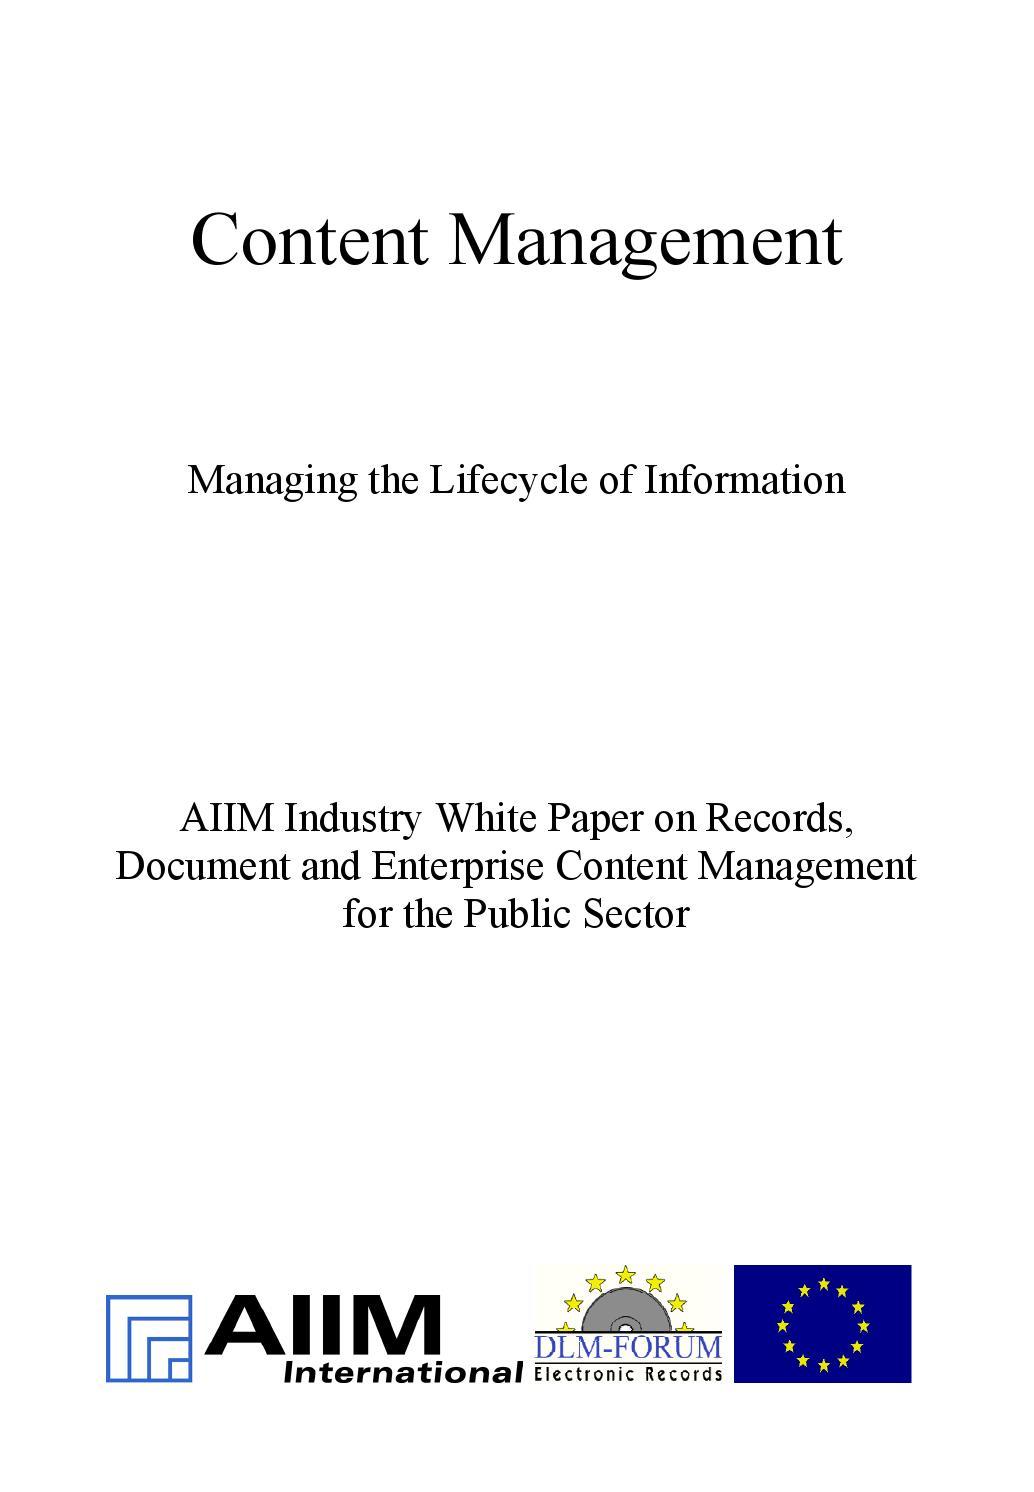 EN] DLM Forum Industry Whitepaper 03 | Content Management ...